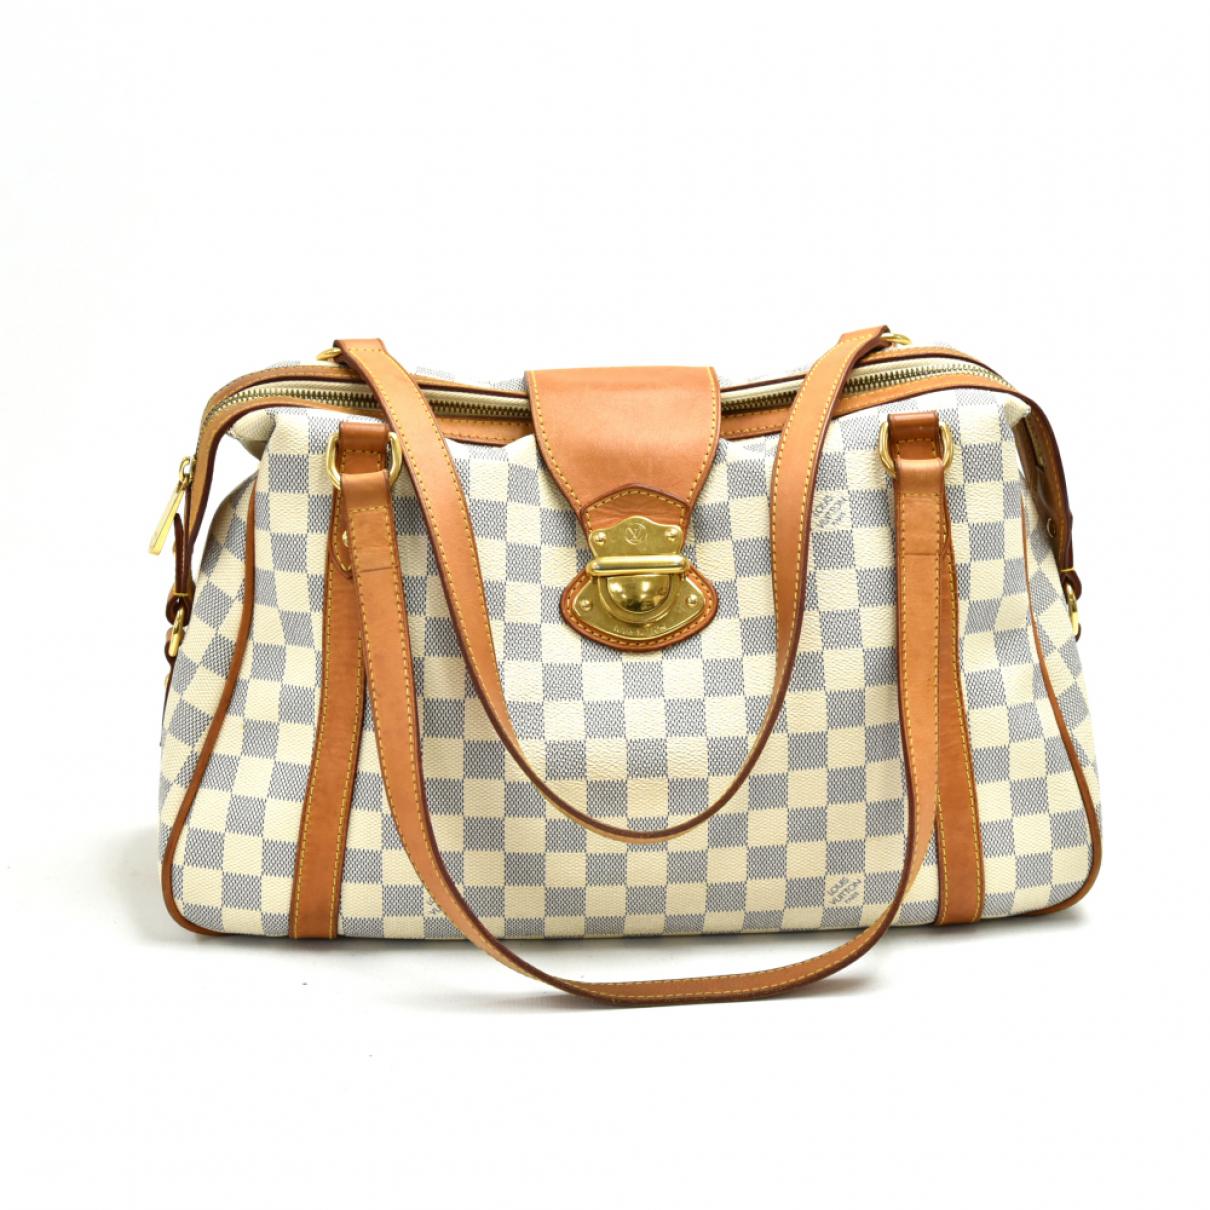 Louis Vuitton - Sac a main Stresa pour femme en toile - marron